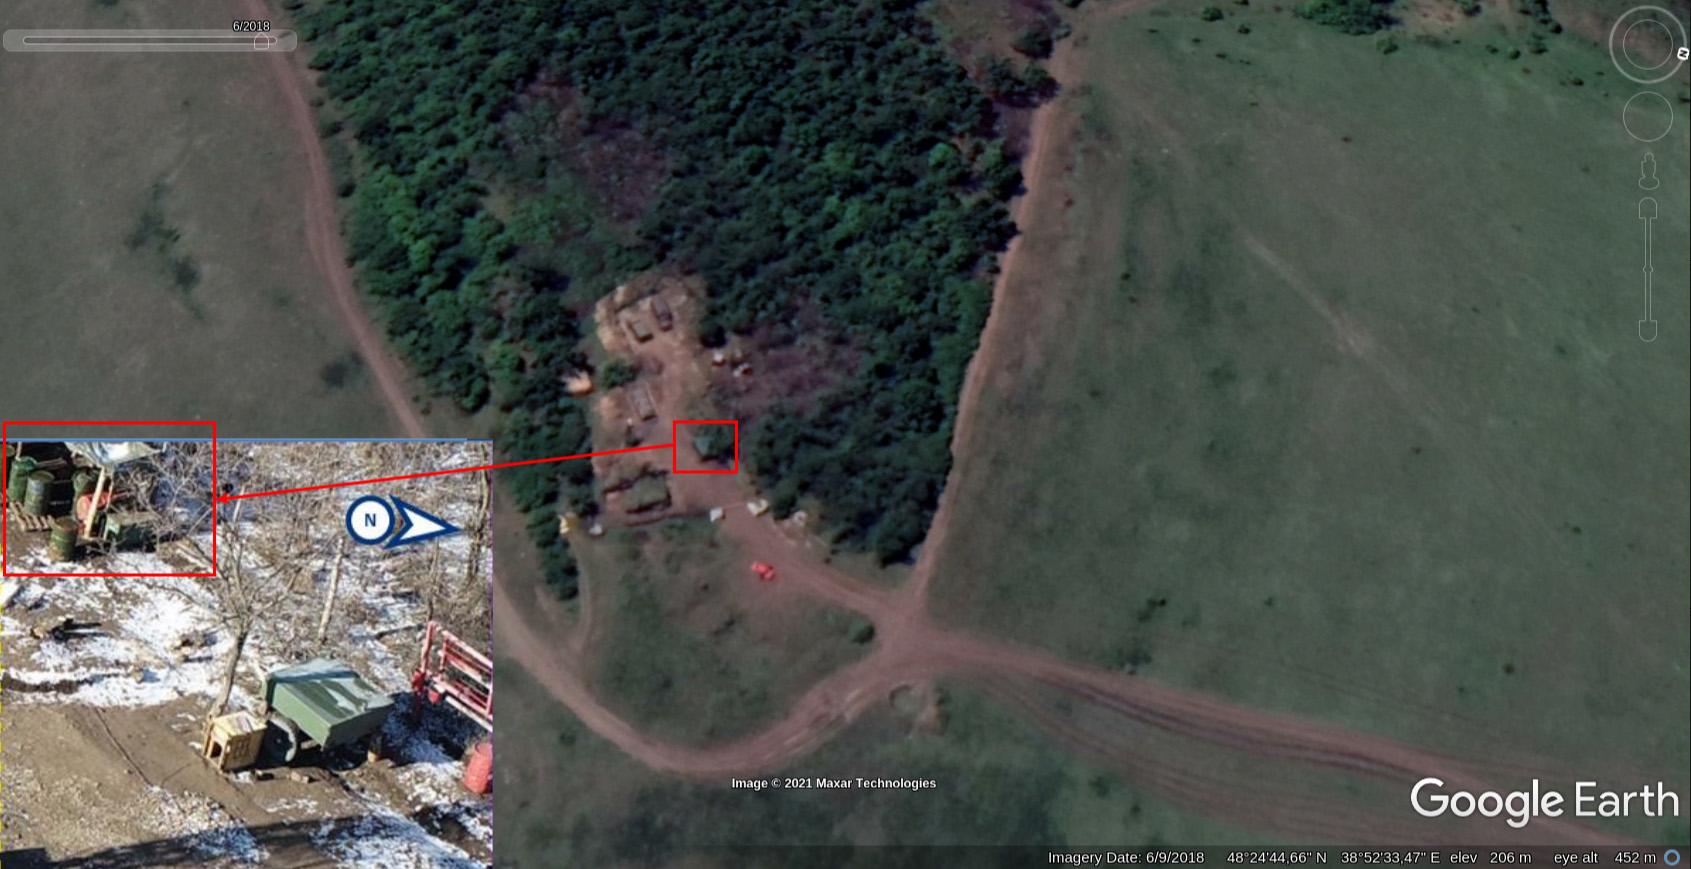 Russian radar system Kasta-2E1 spotted in Donbas 4